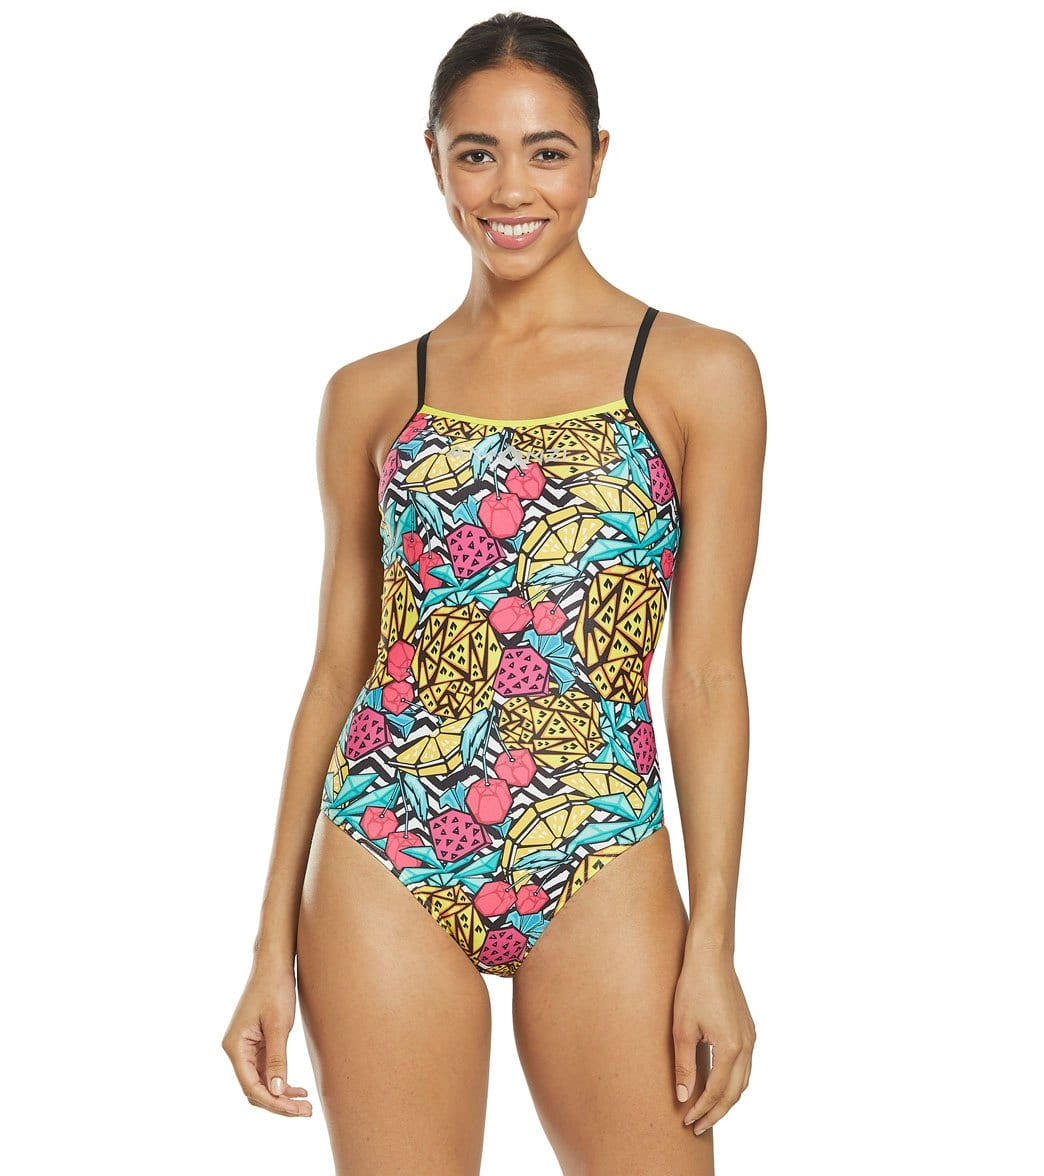 Amanzi Women's Pineapple Punch One Piece Swimsuit